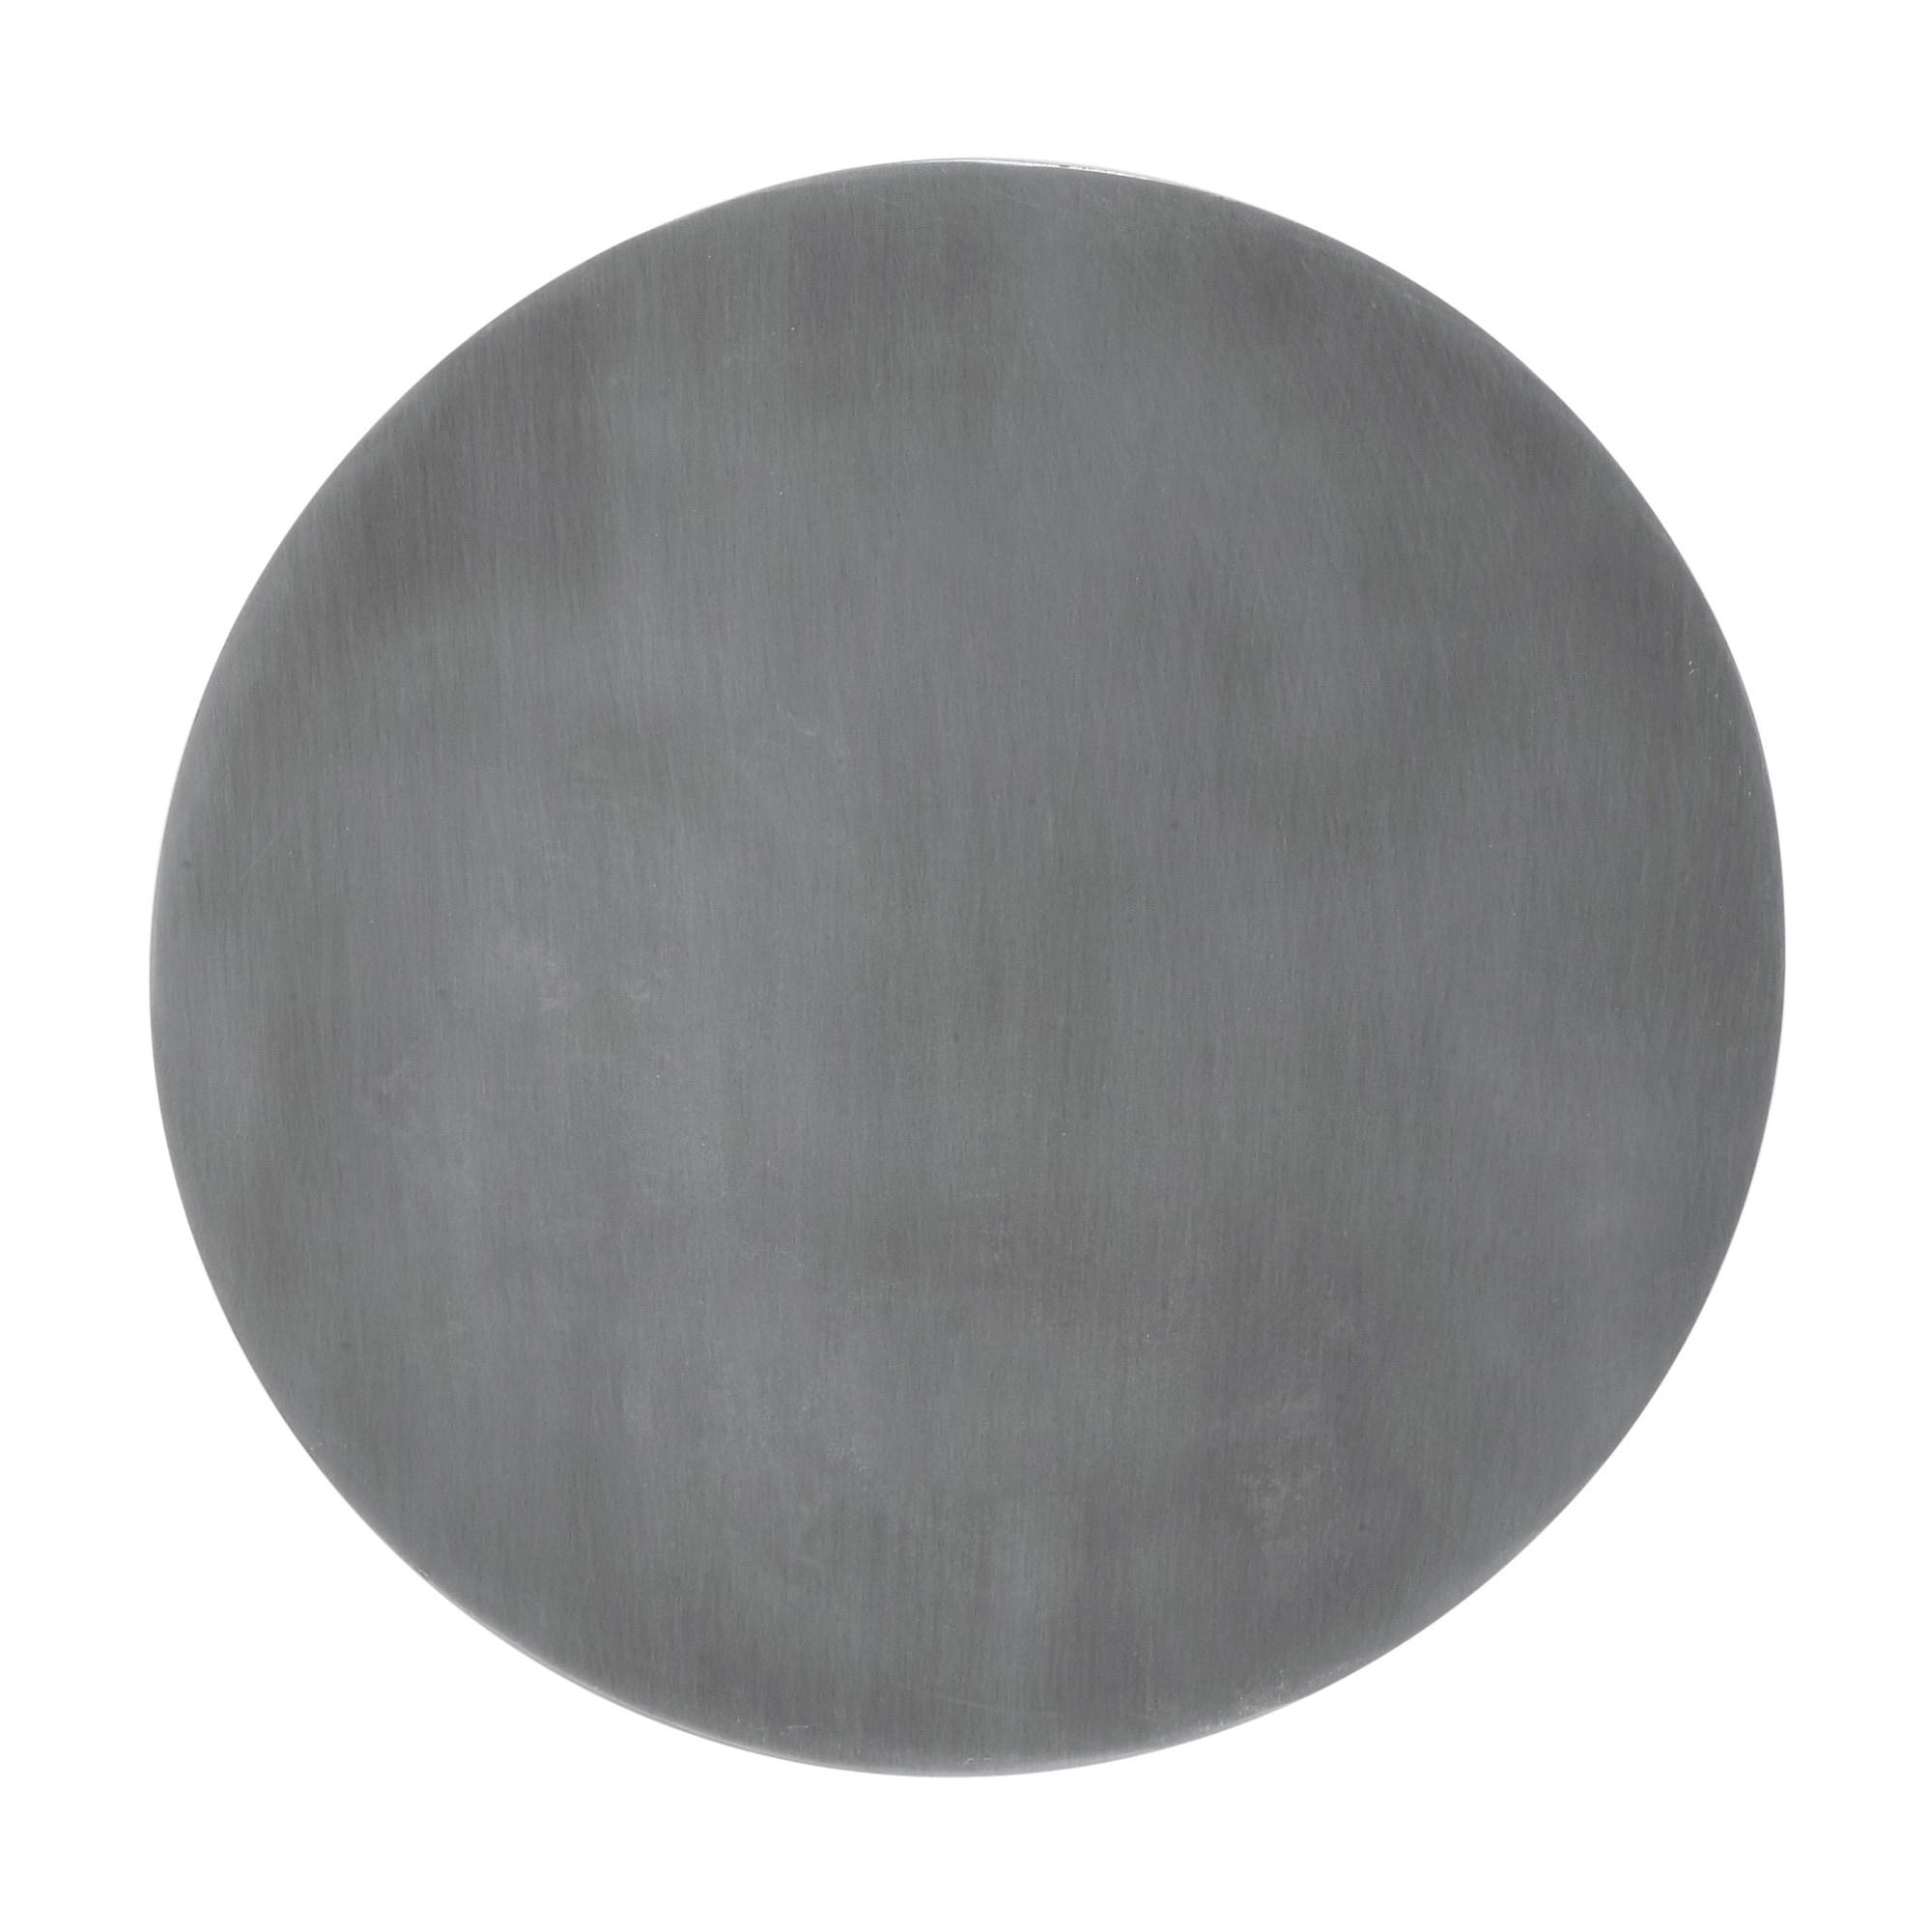 Fullmoon Ø25 vägglampa pale silver